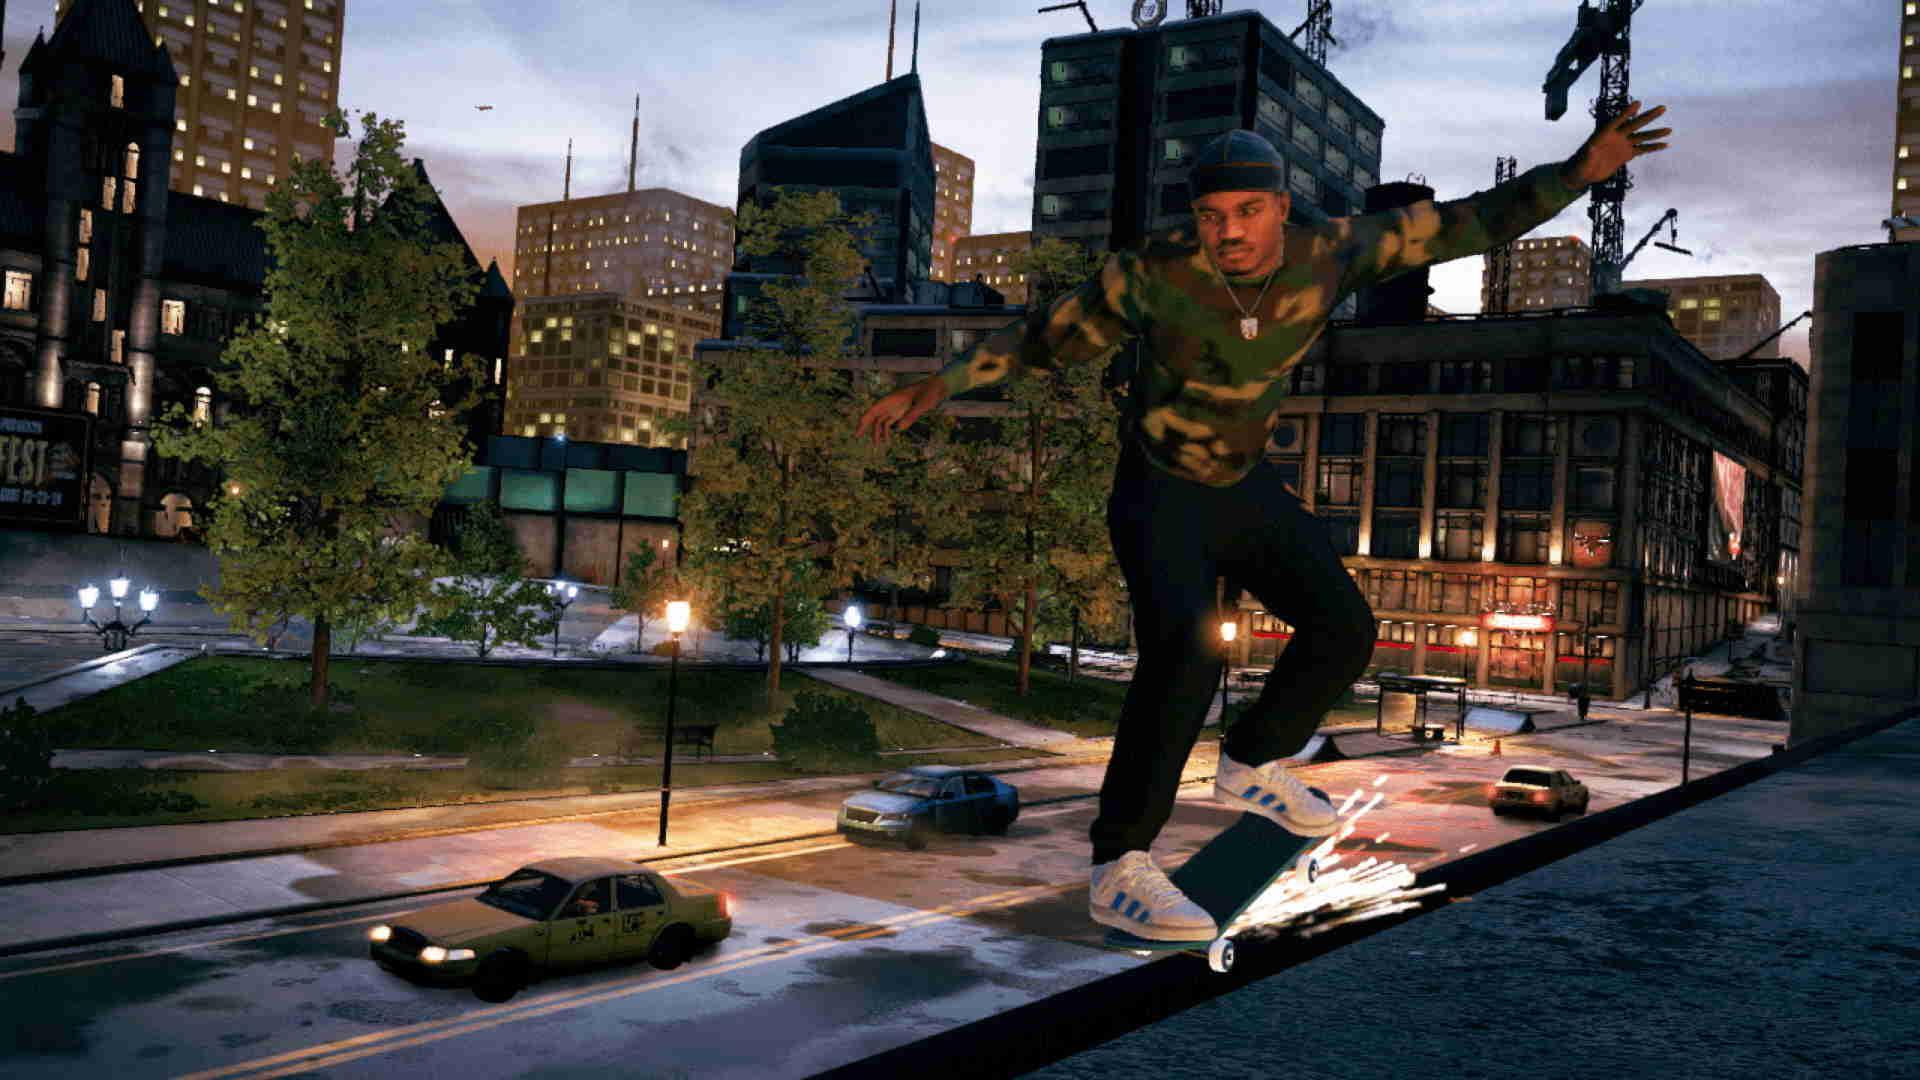 Tony Hawk's Pro Skater 1 + 2 Switch on the go!